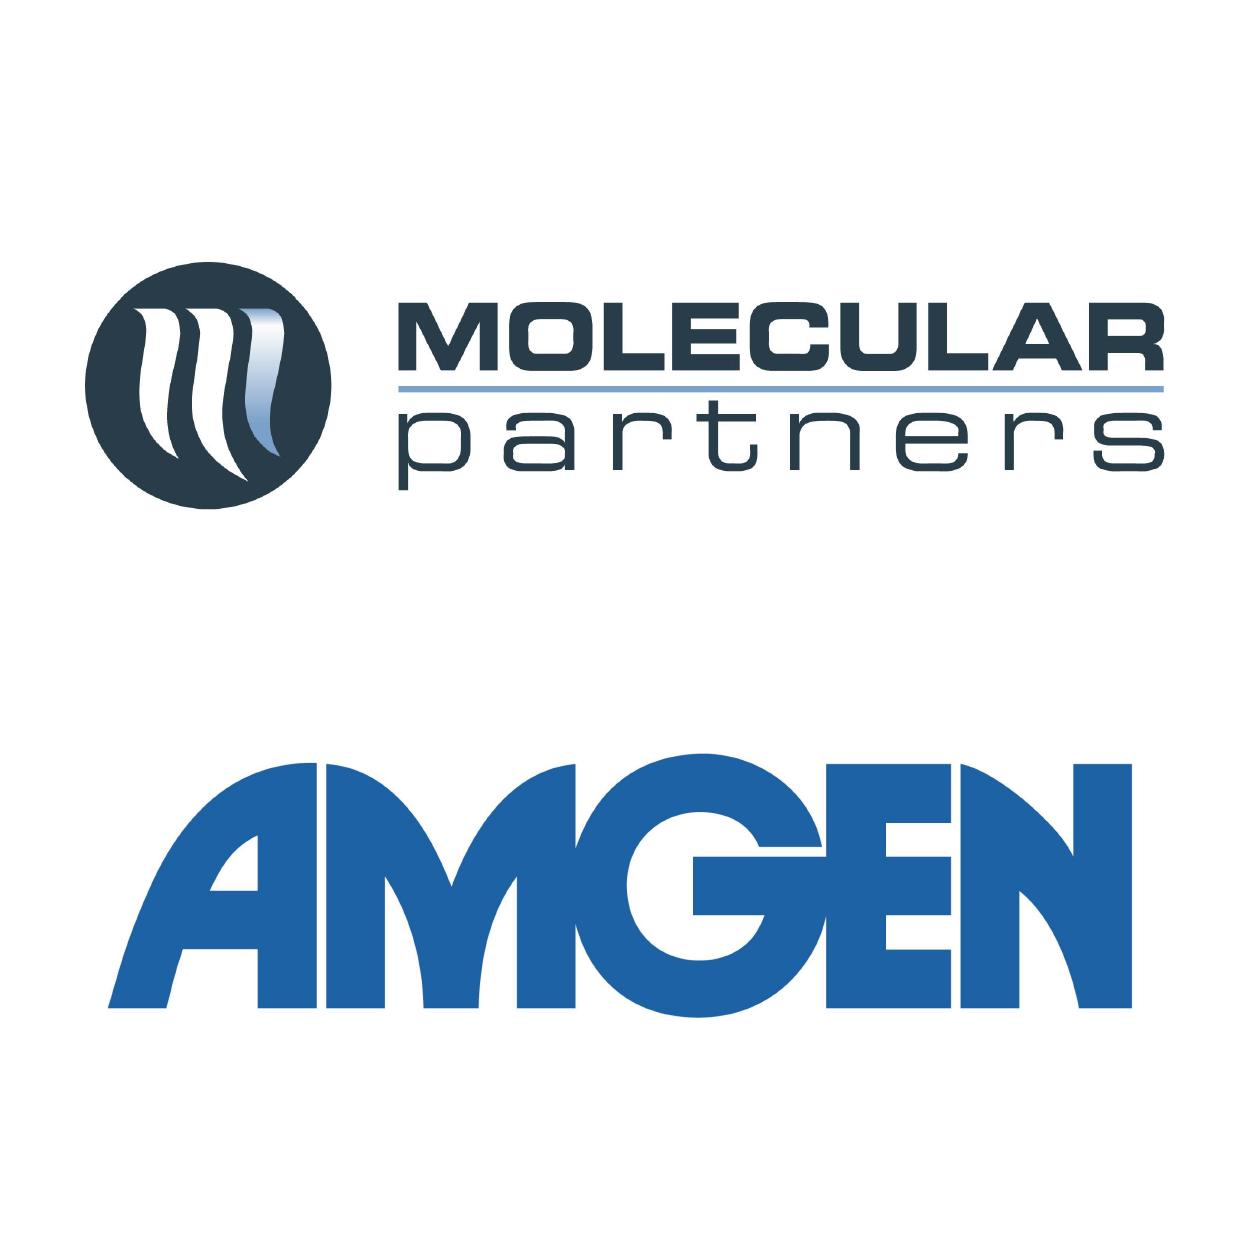 Molecular Partners and Amgen